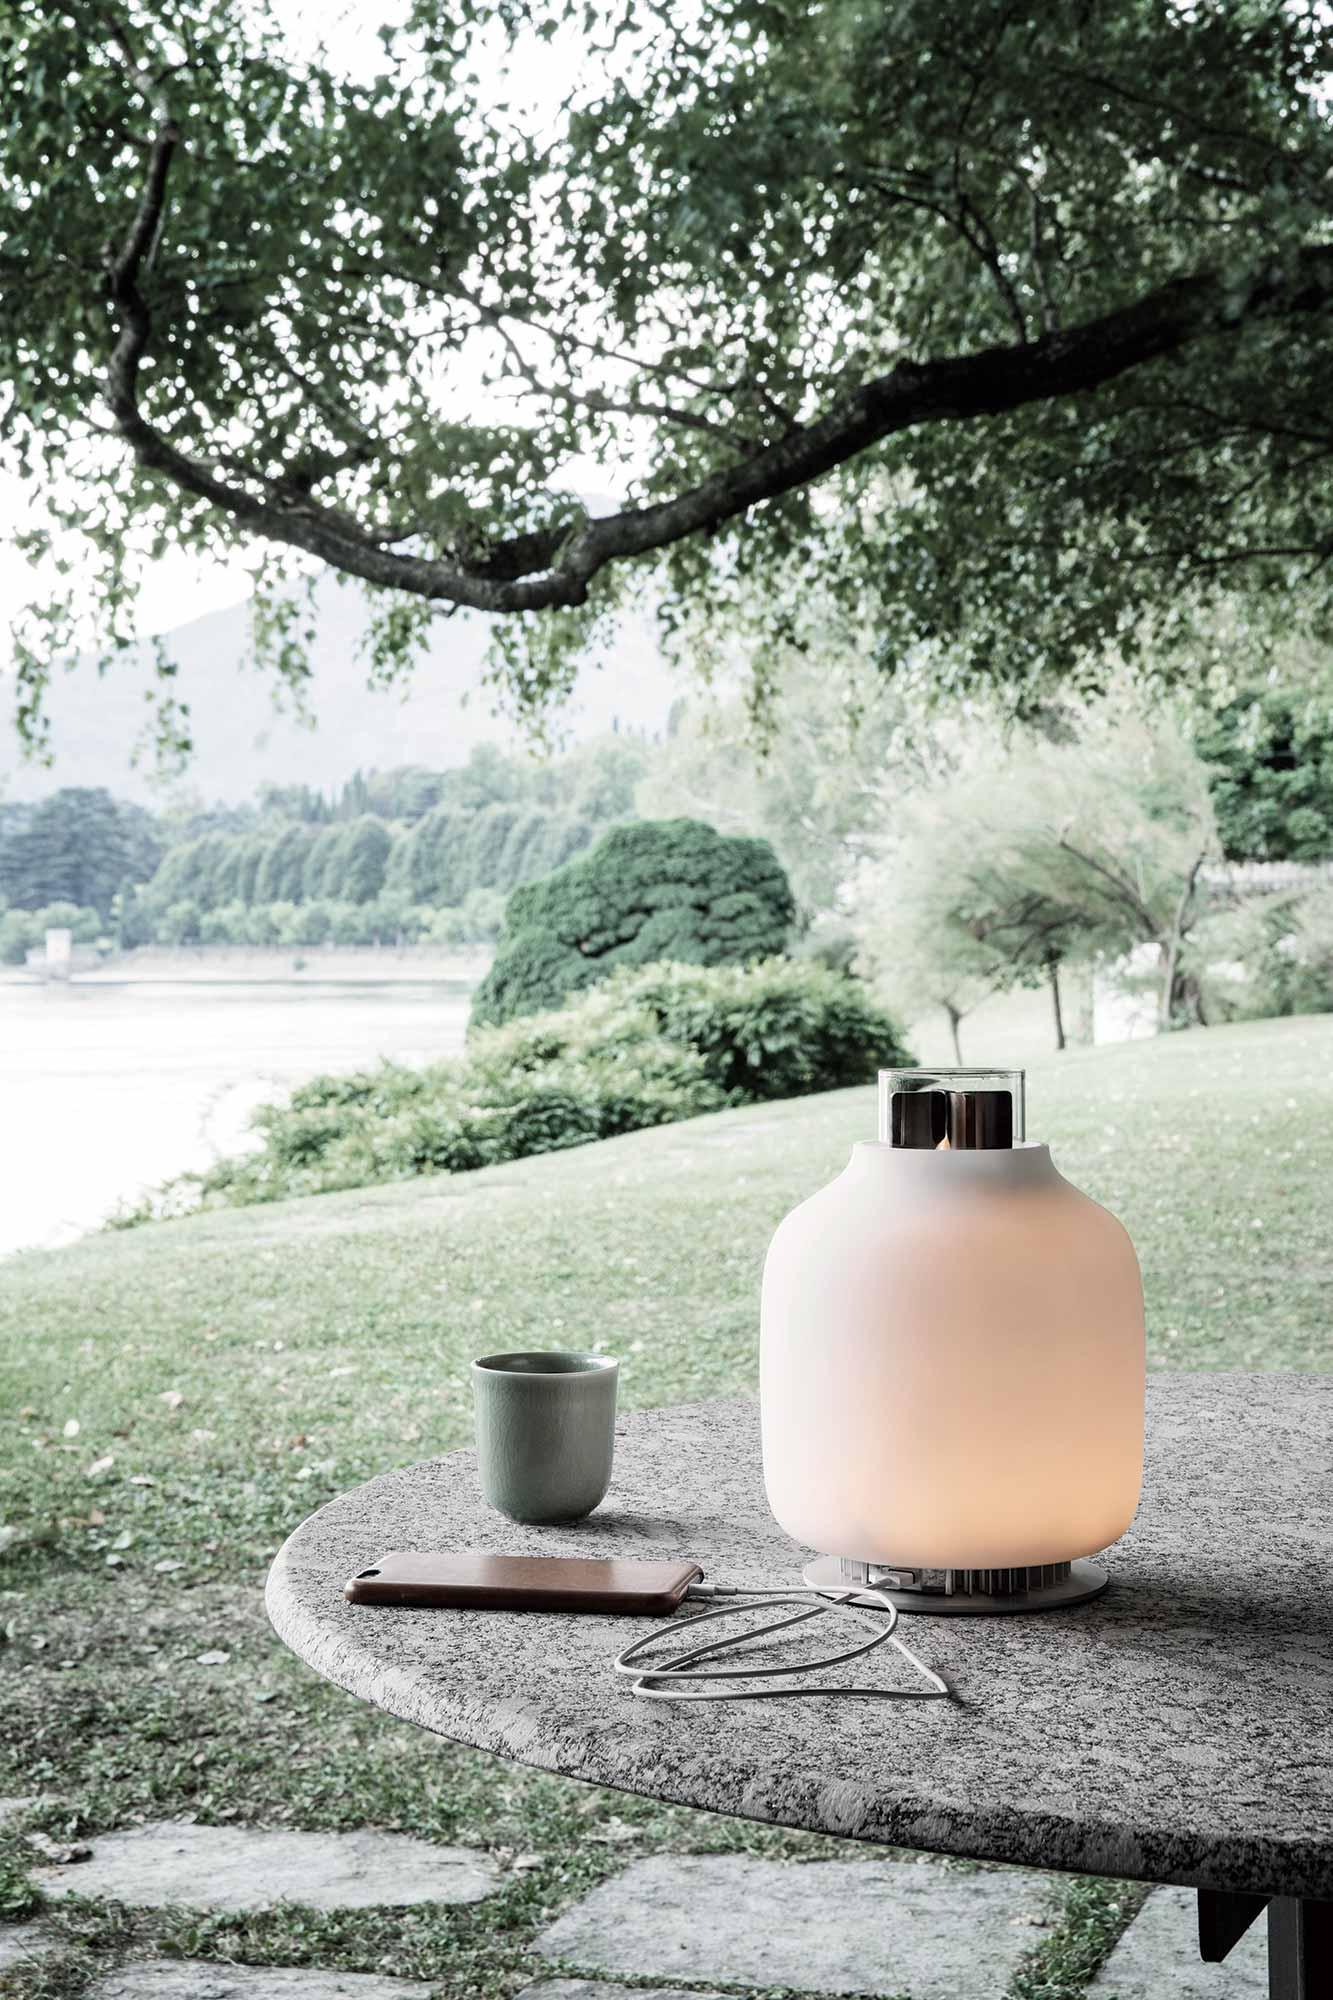 Candela Table Lamp